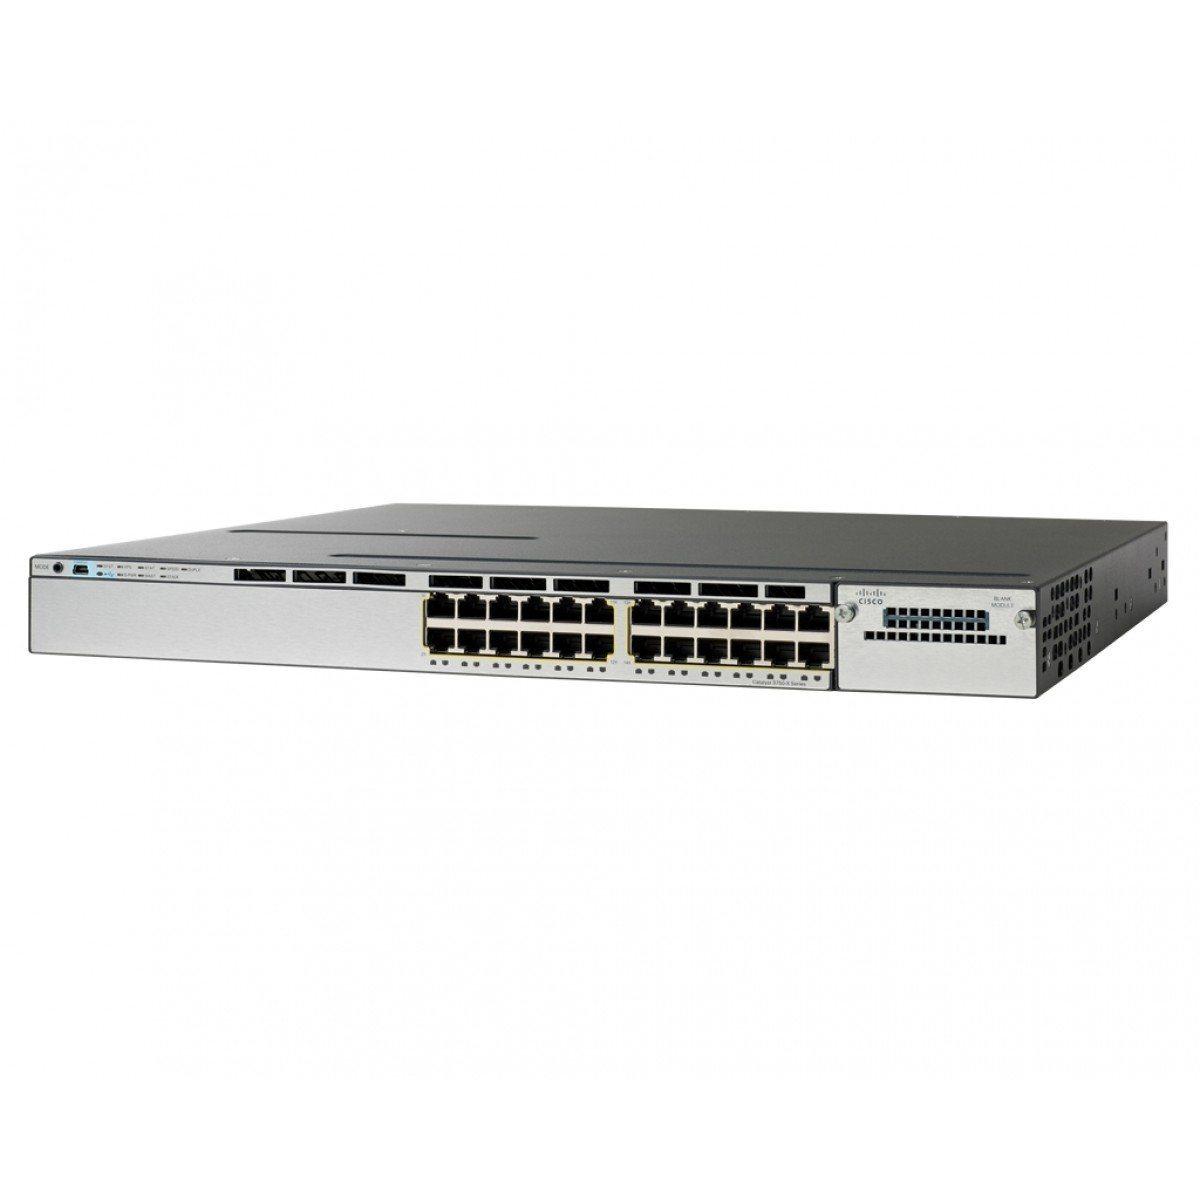 Switch Cisco Catalyst WS-C3750X-24P-L 24 PORTAS POE LAN BASE (SERVICO CON-SMBS-3750X2PL)